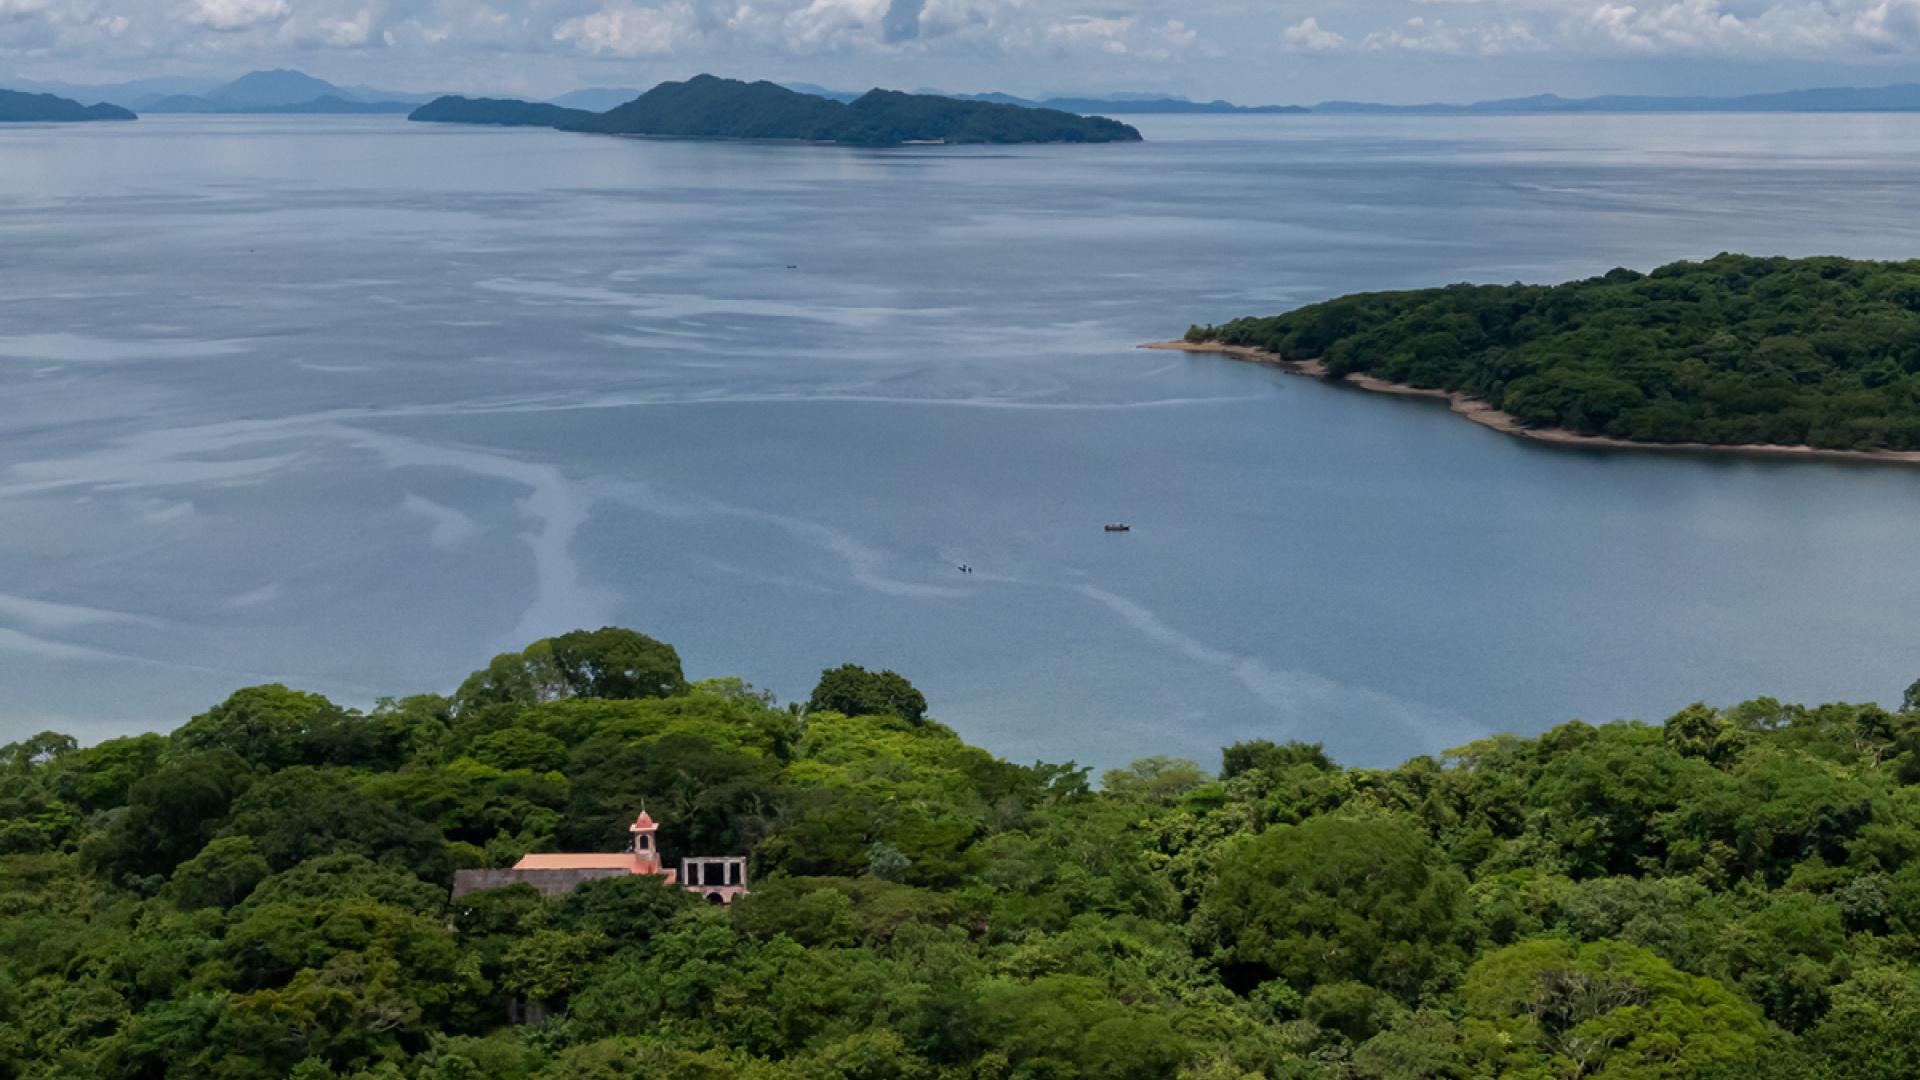 San Lucas prison island Costa Rica national park